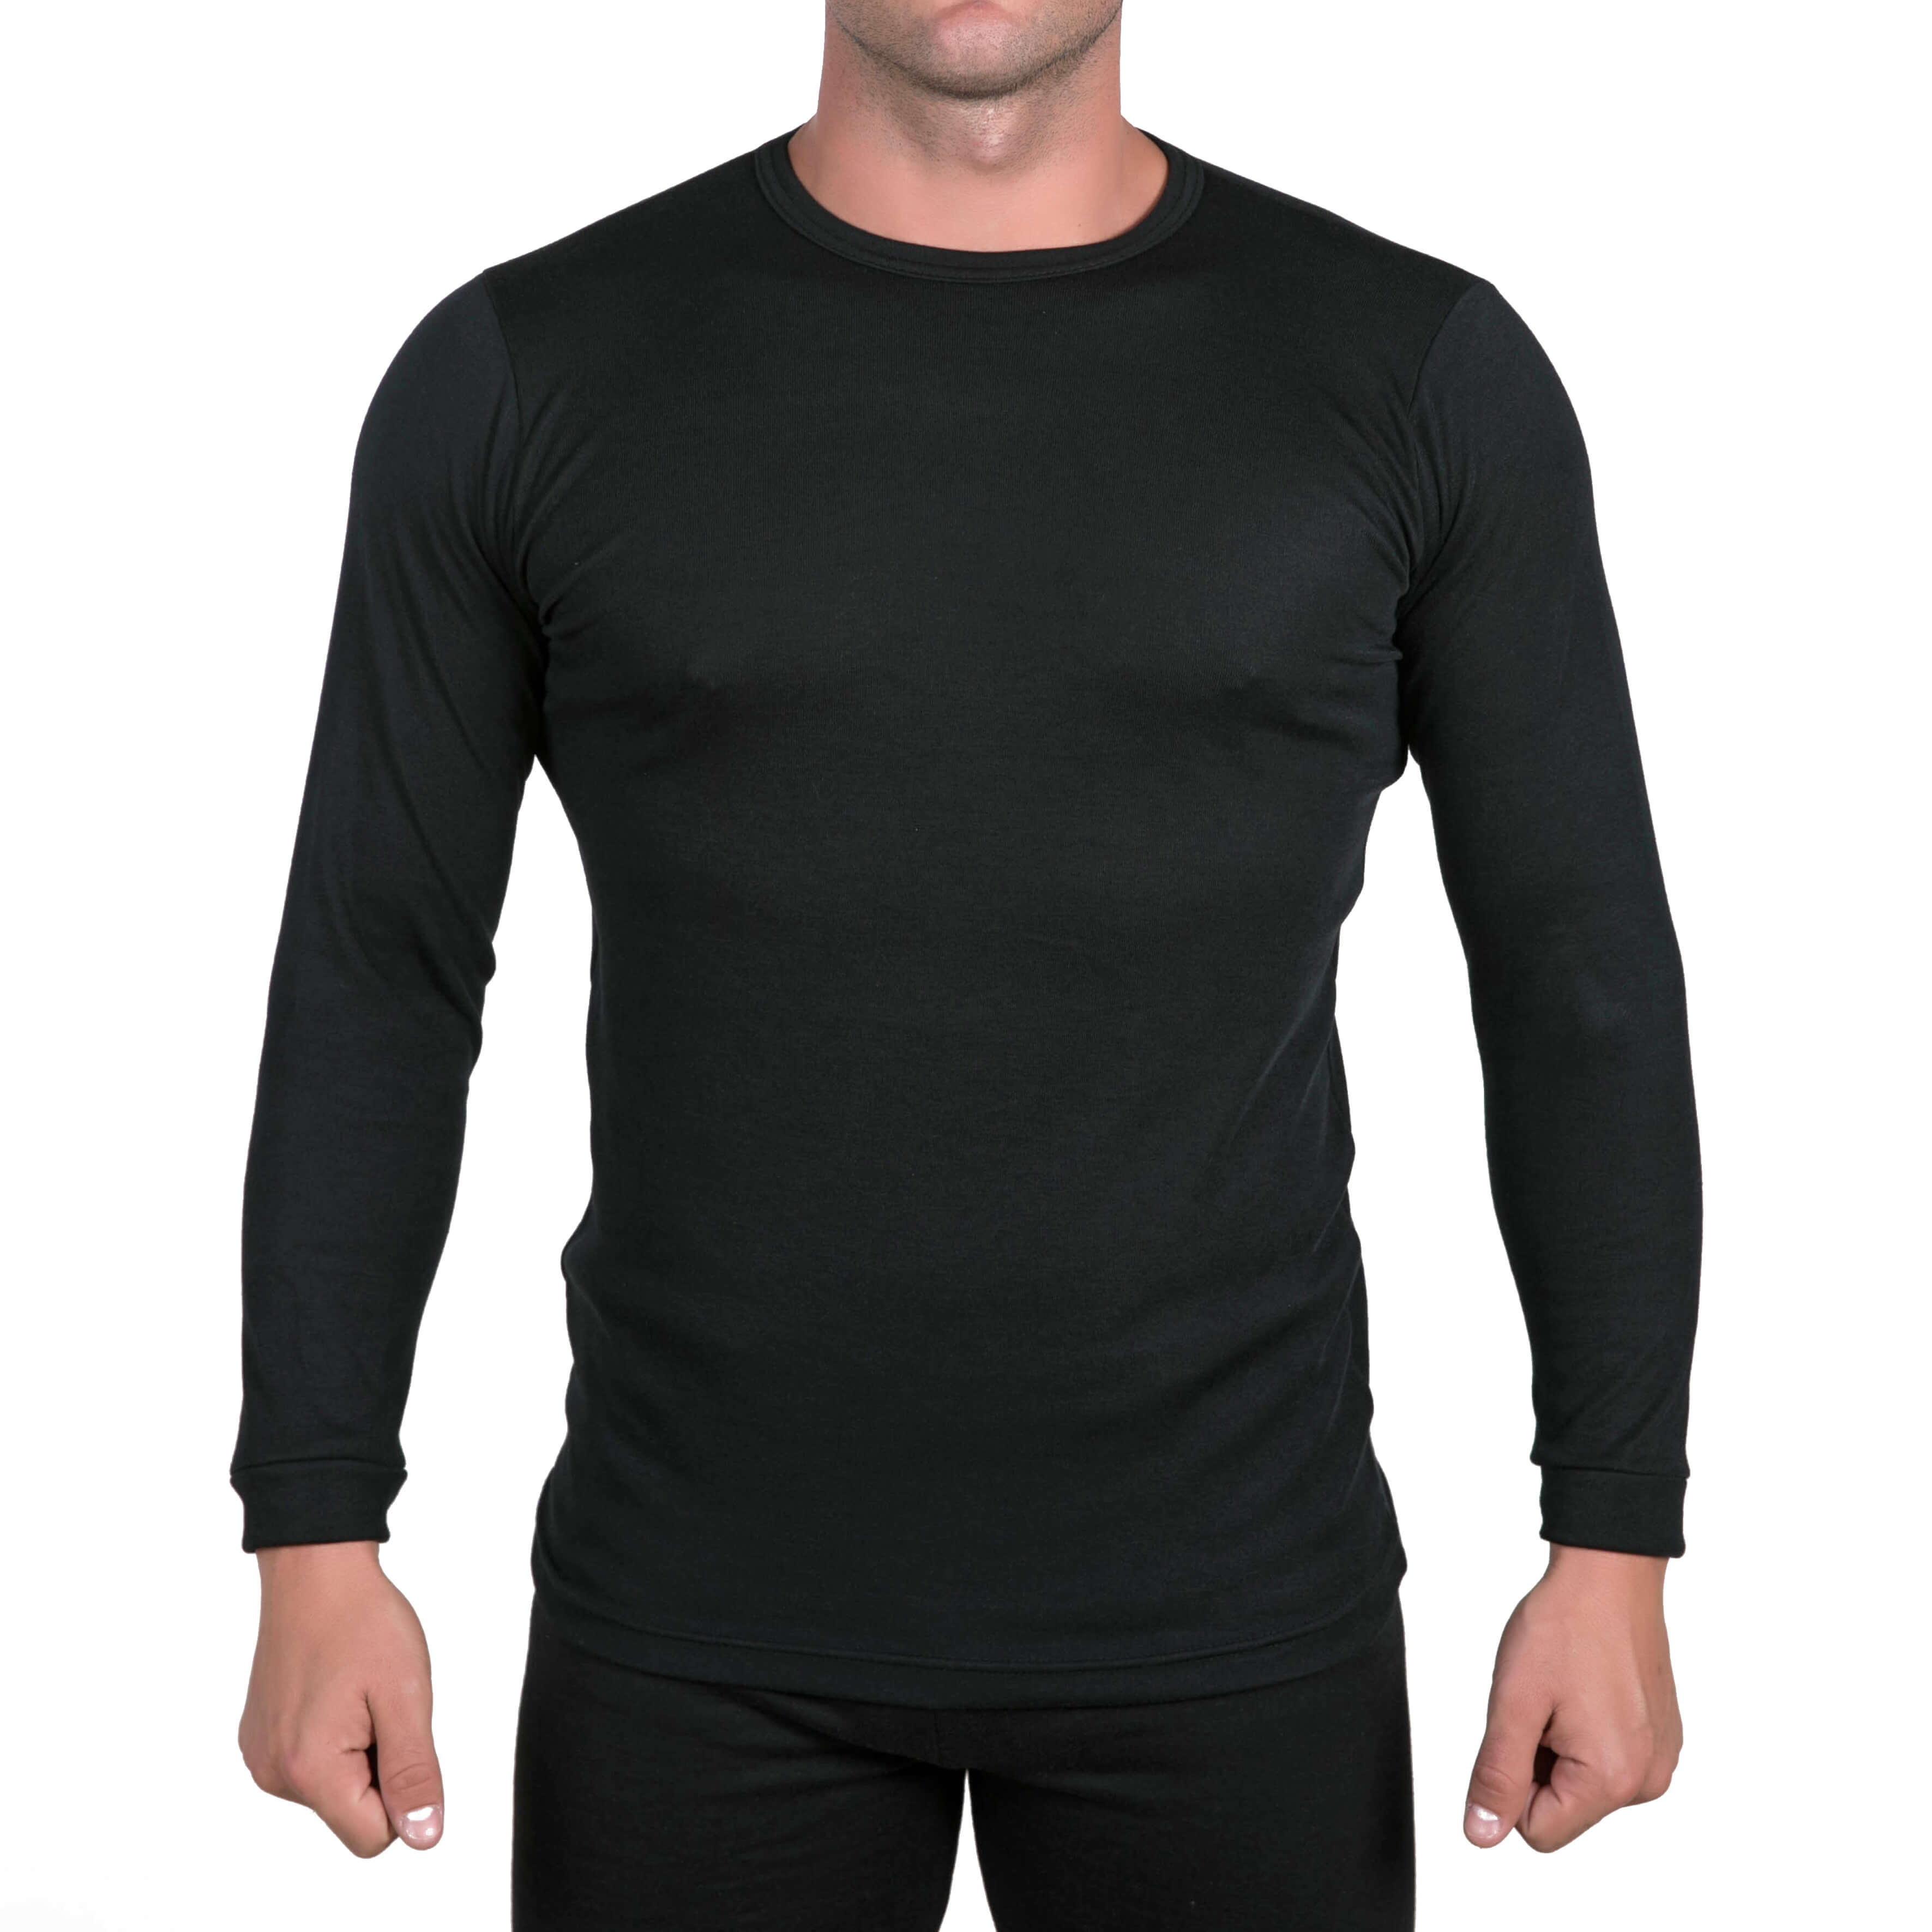 512632361a5 Ισοθερμική μπλούζα Unisex